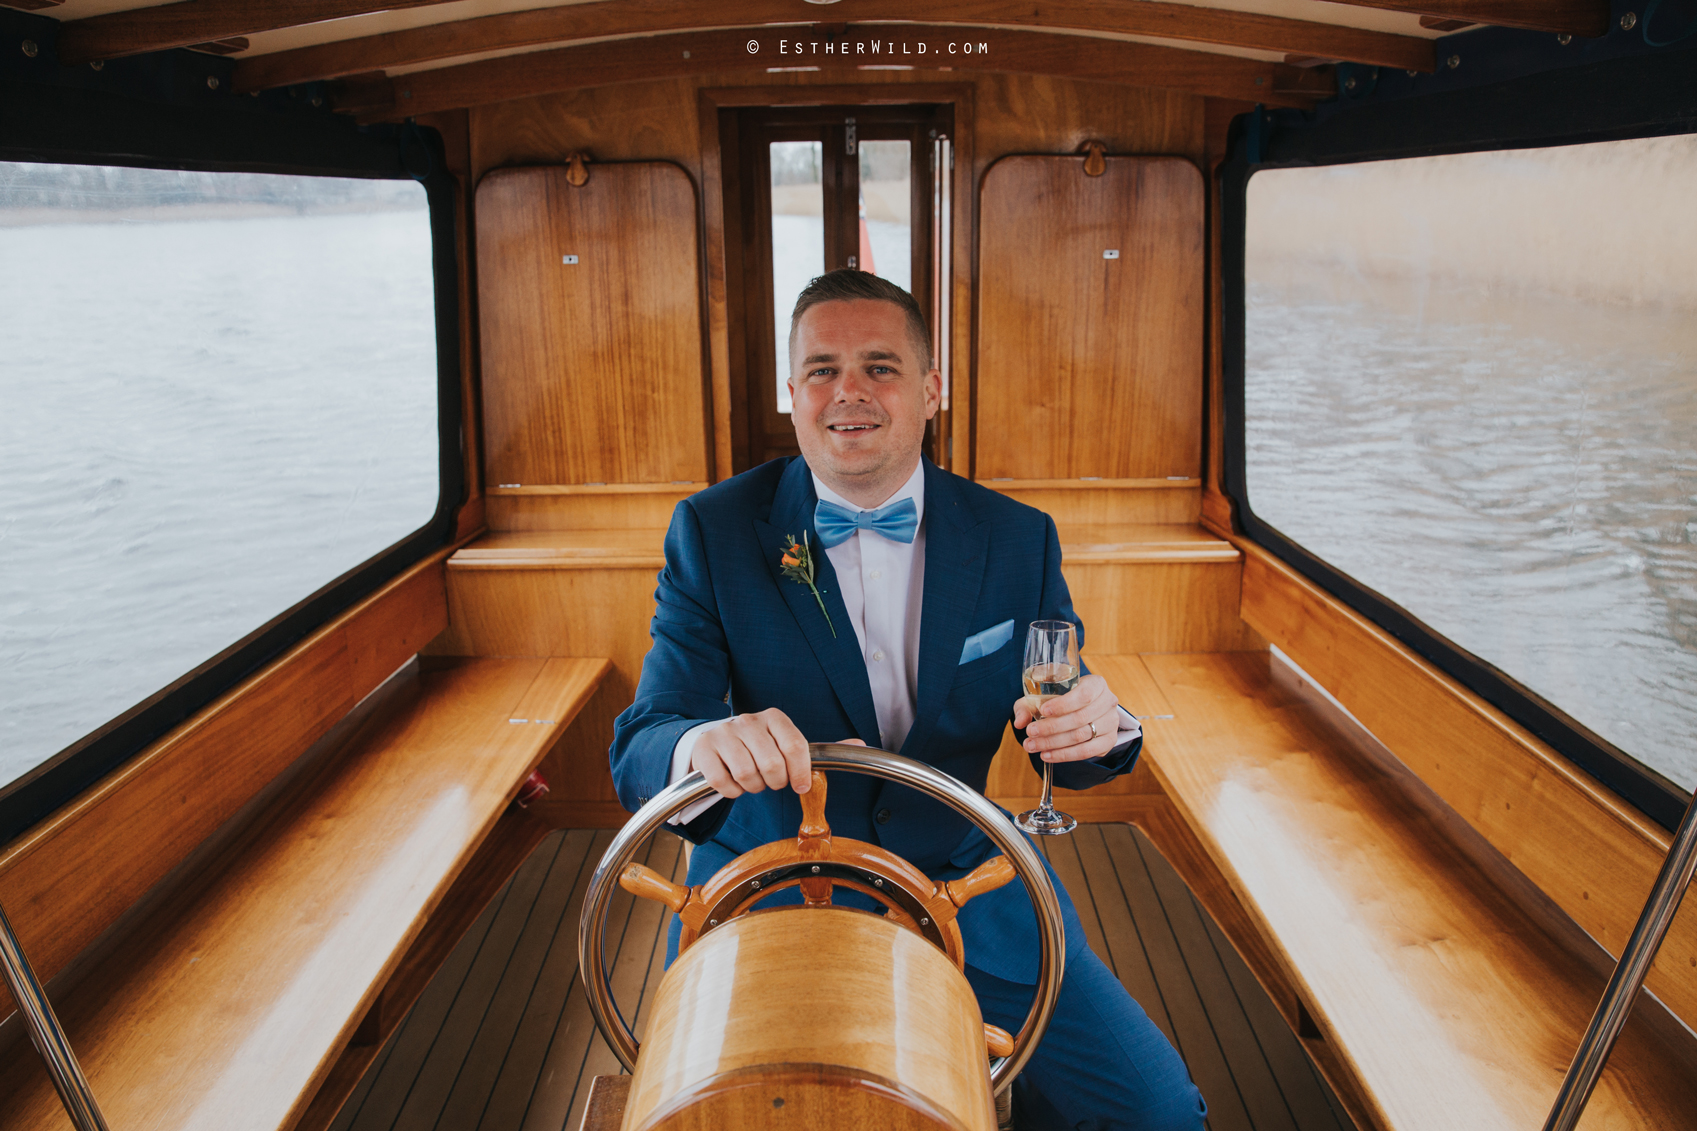 The_BoatHouse_Wedding_Venue_Ormesby_Norfolk_Broads_Boat_Wedding_Photography_Esther_Wild_Photographer_IMG_1465.jpg